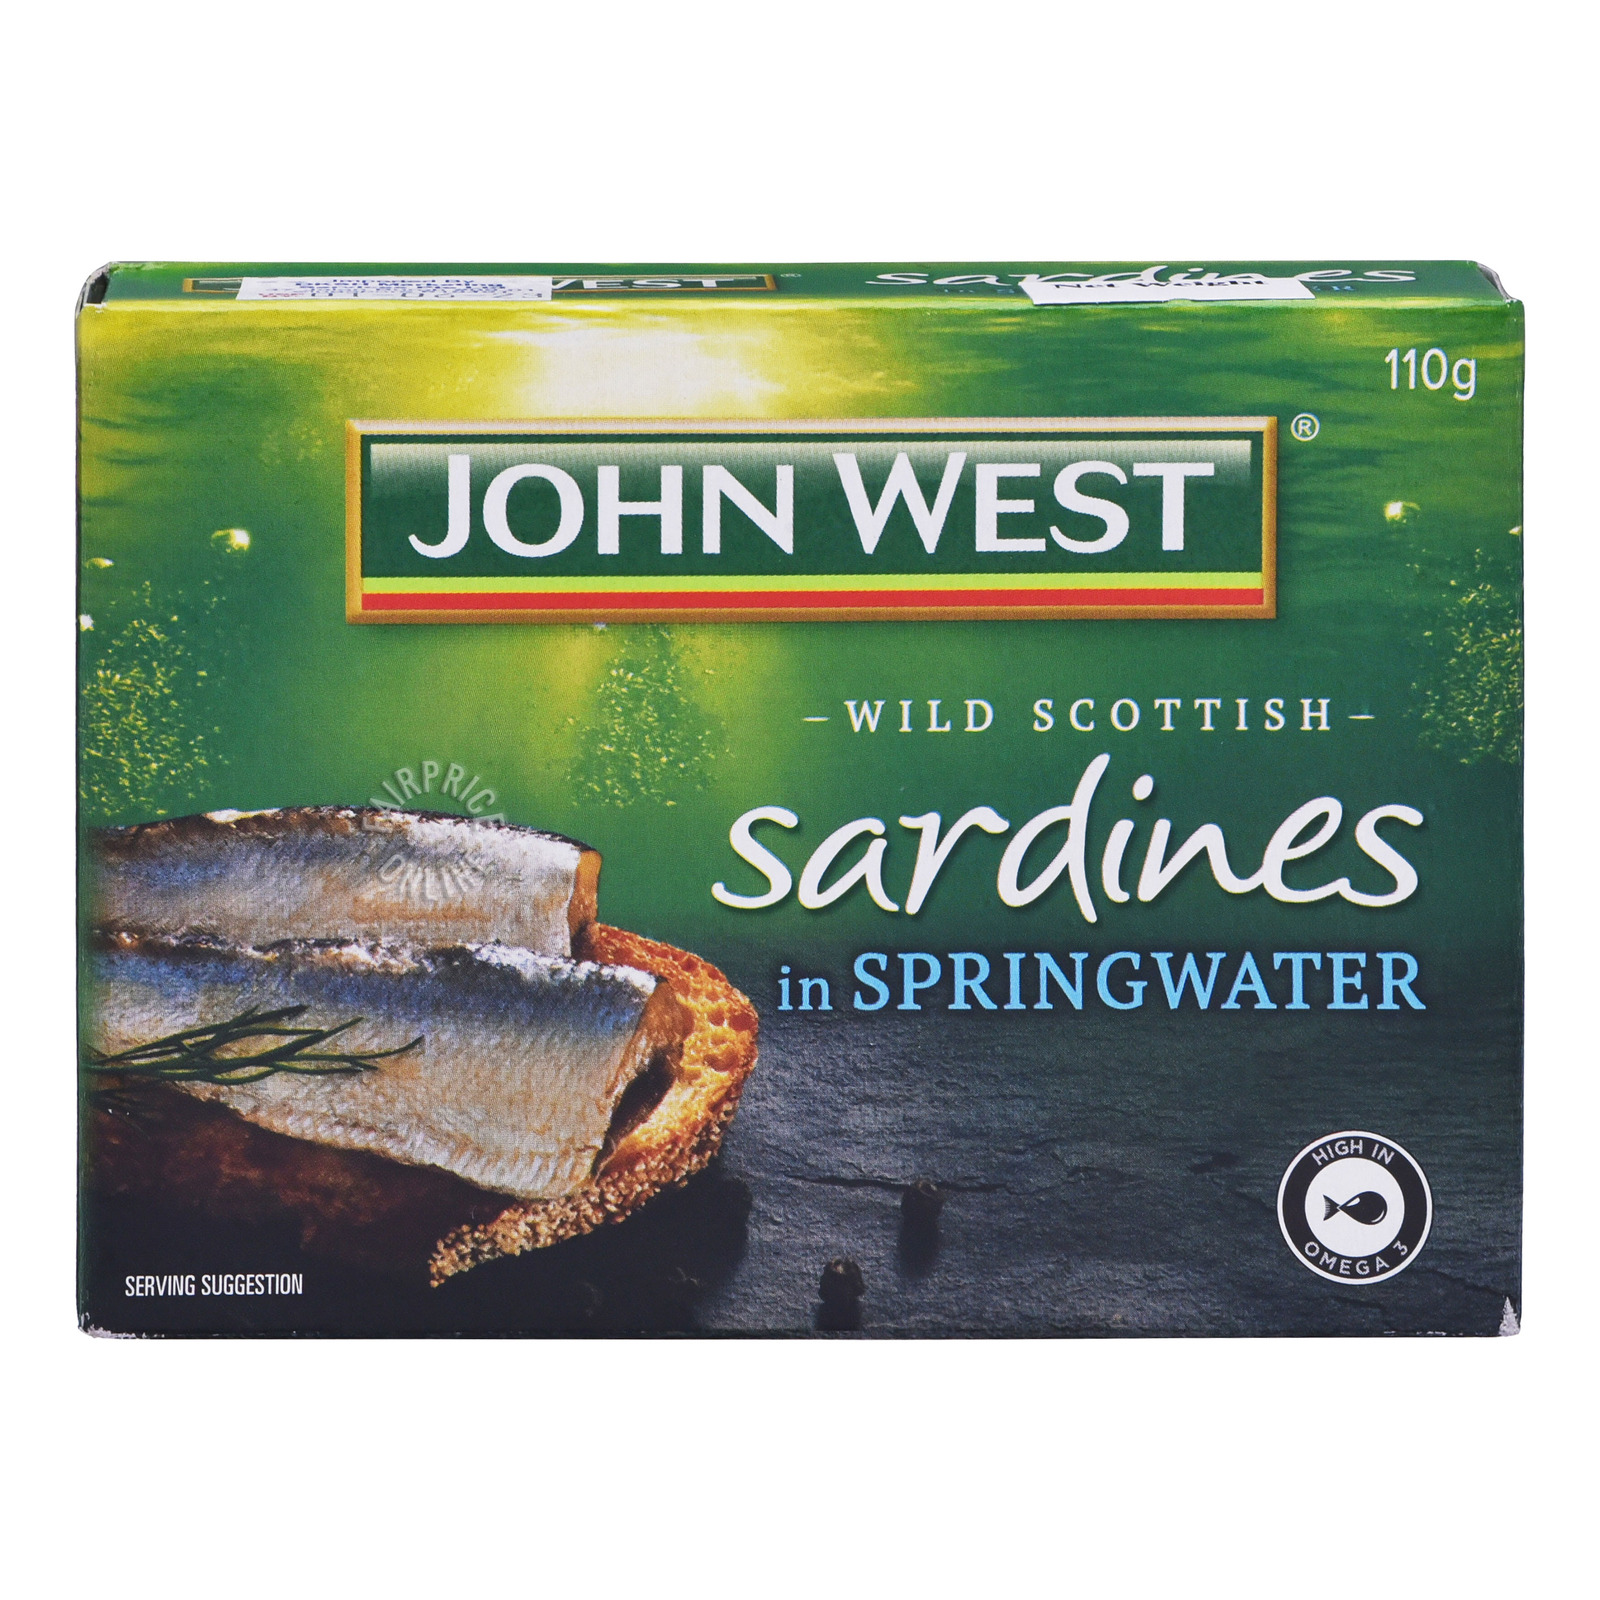 John West Sardines in Springwater